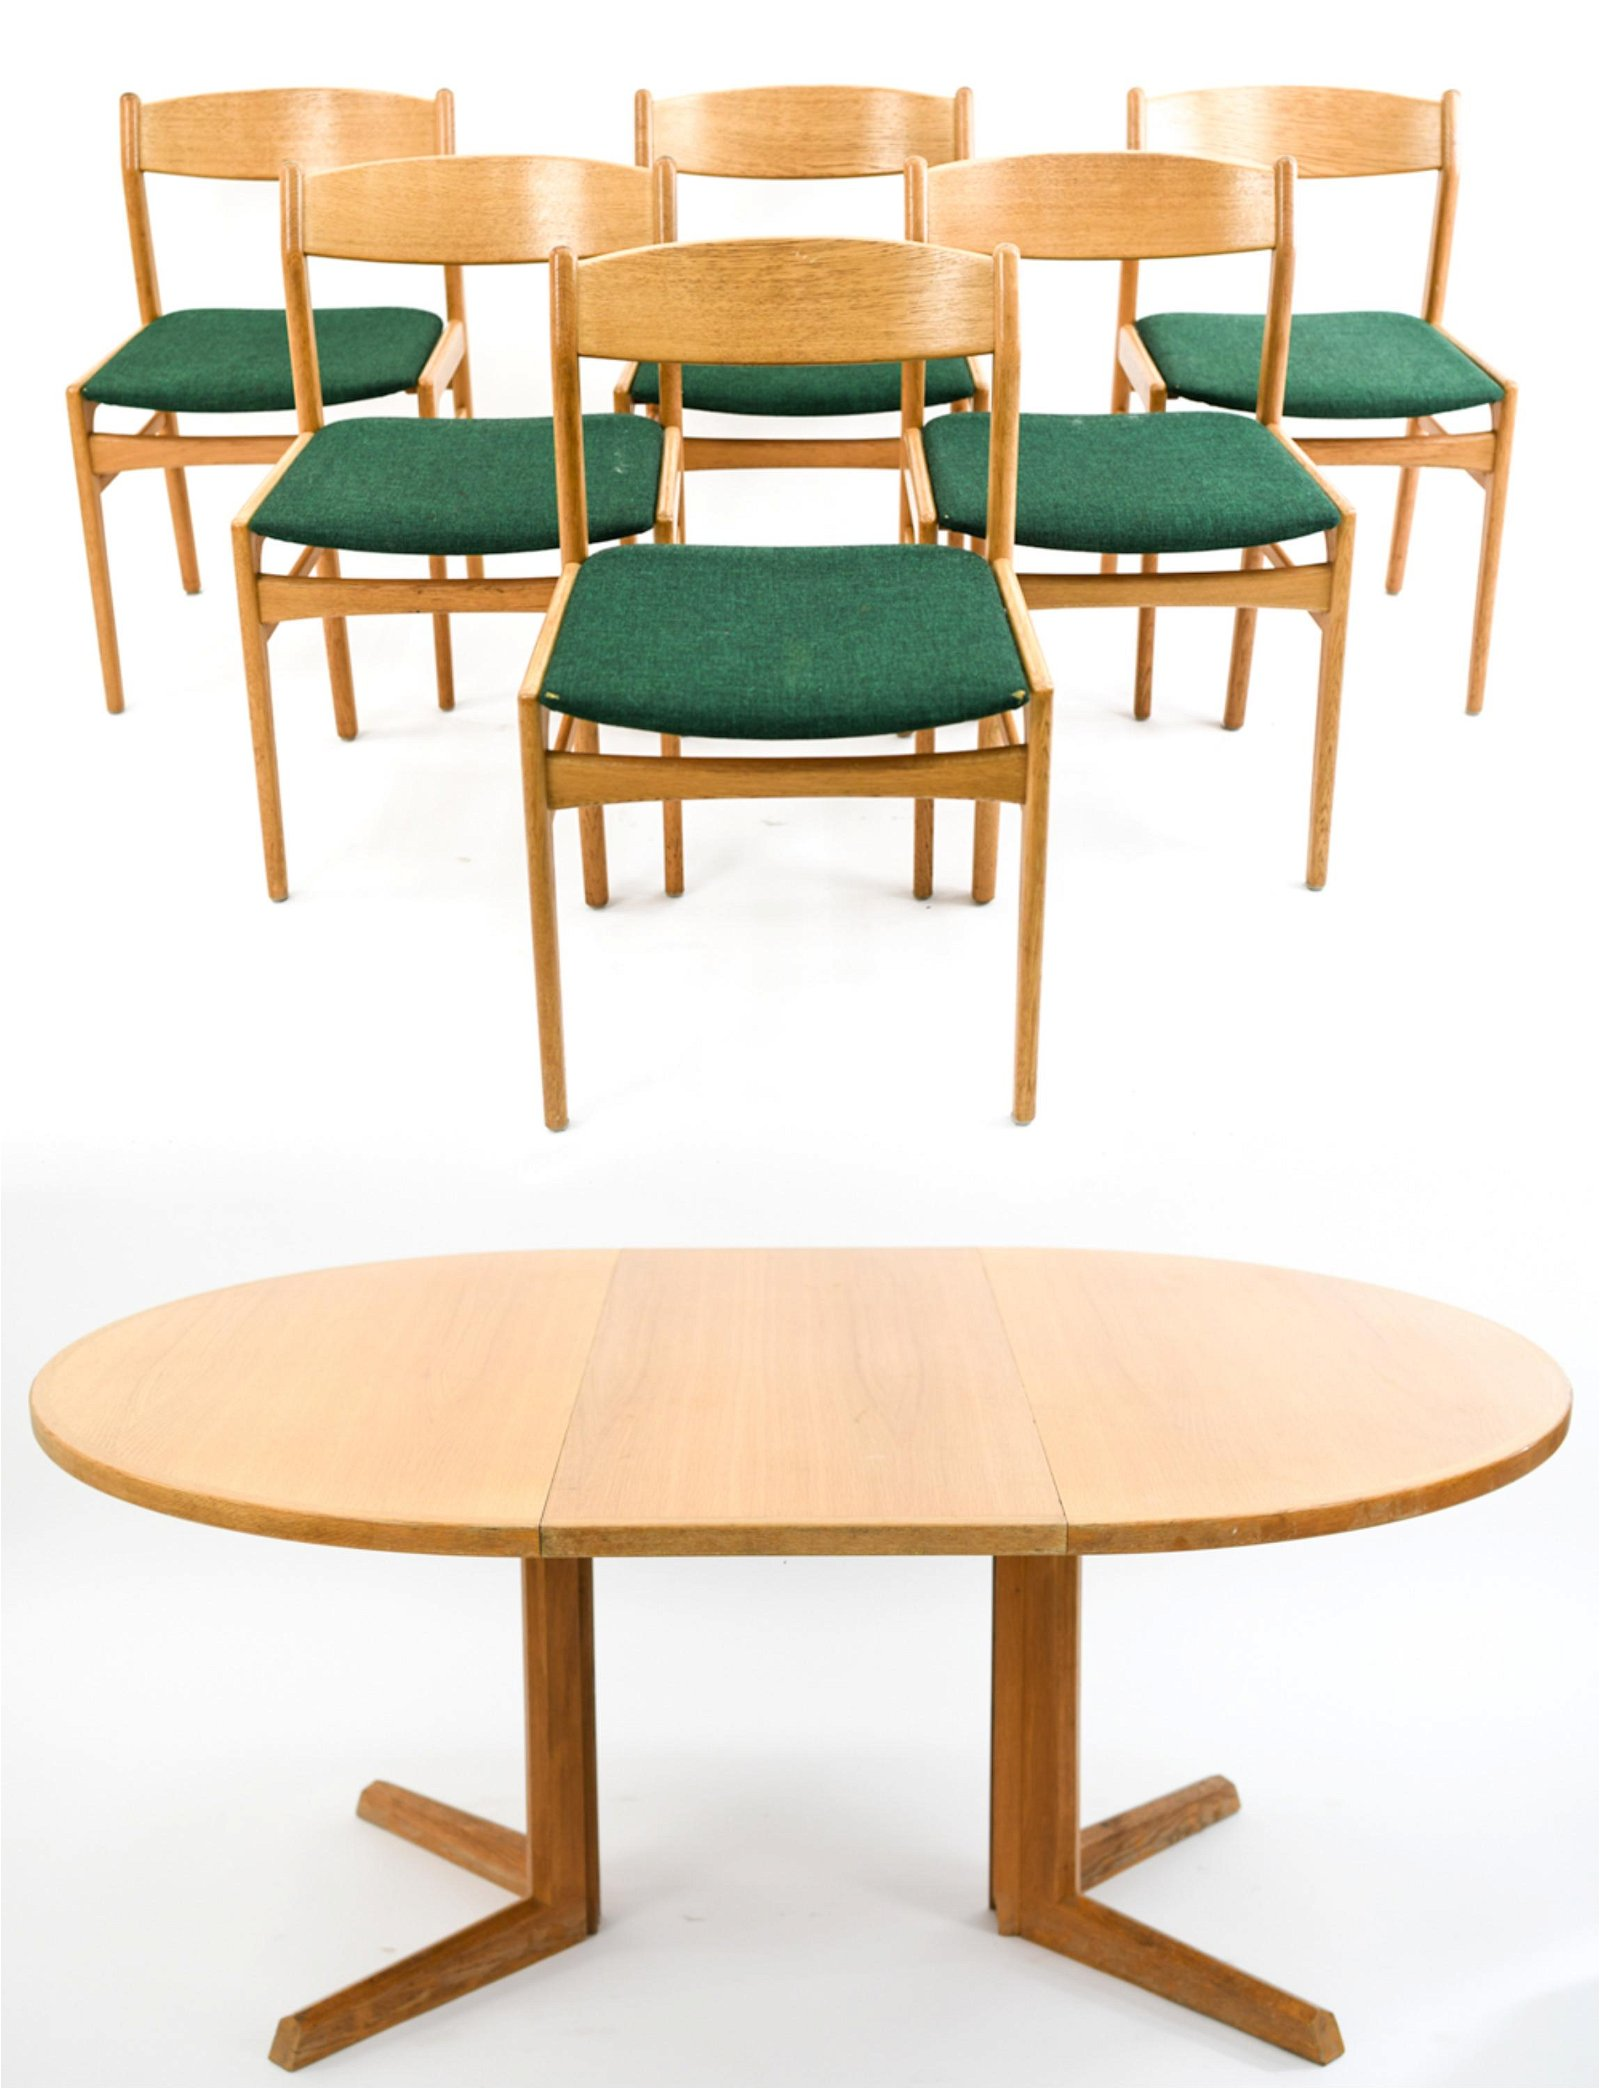 JOHANNES ANDERSEN OAK DINING TABLE & (6) CHAIRS